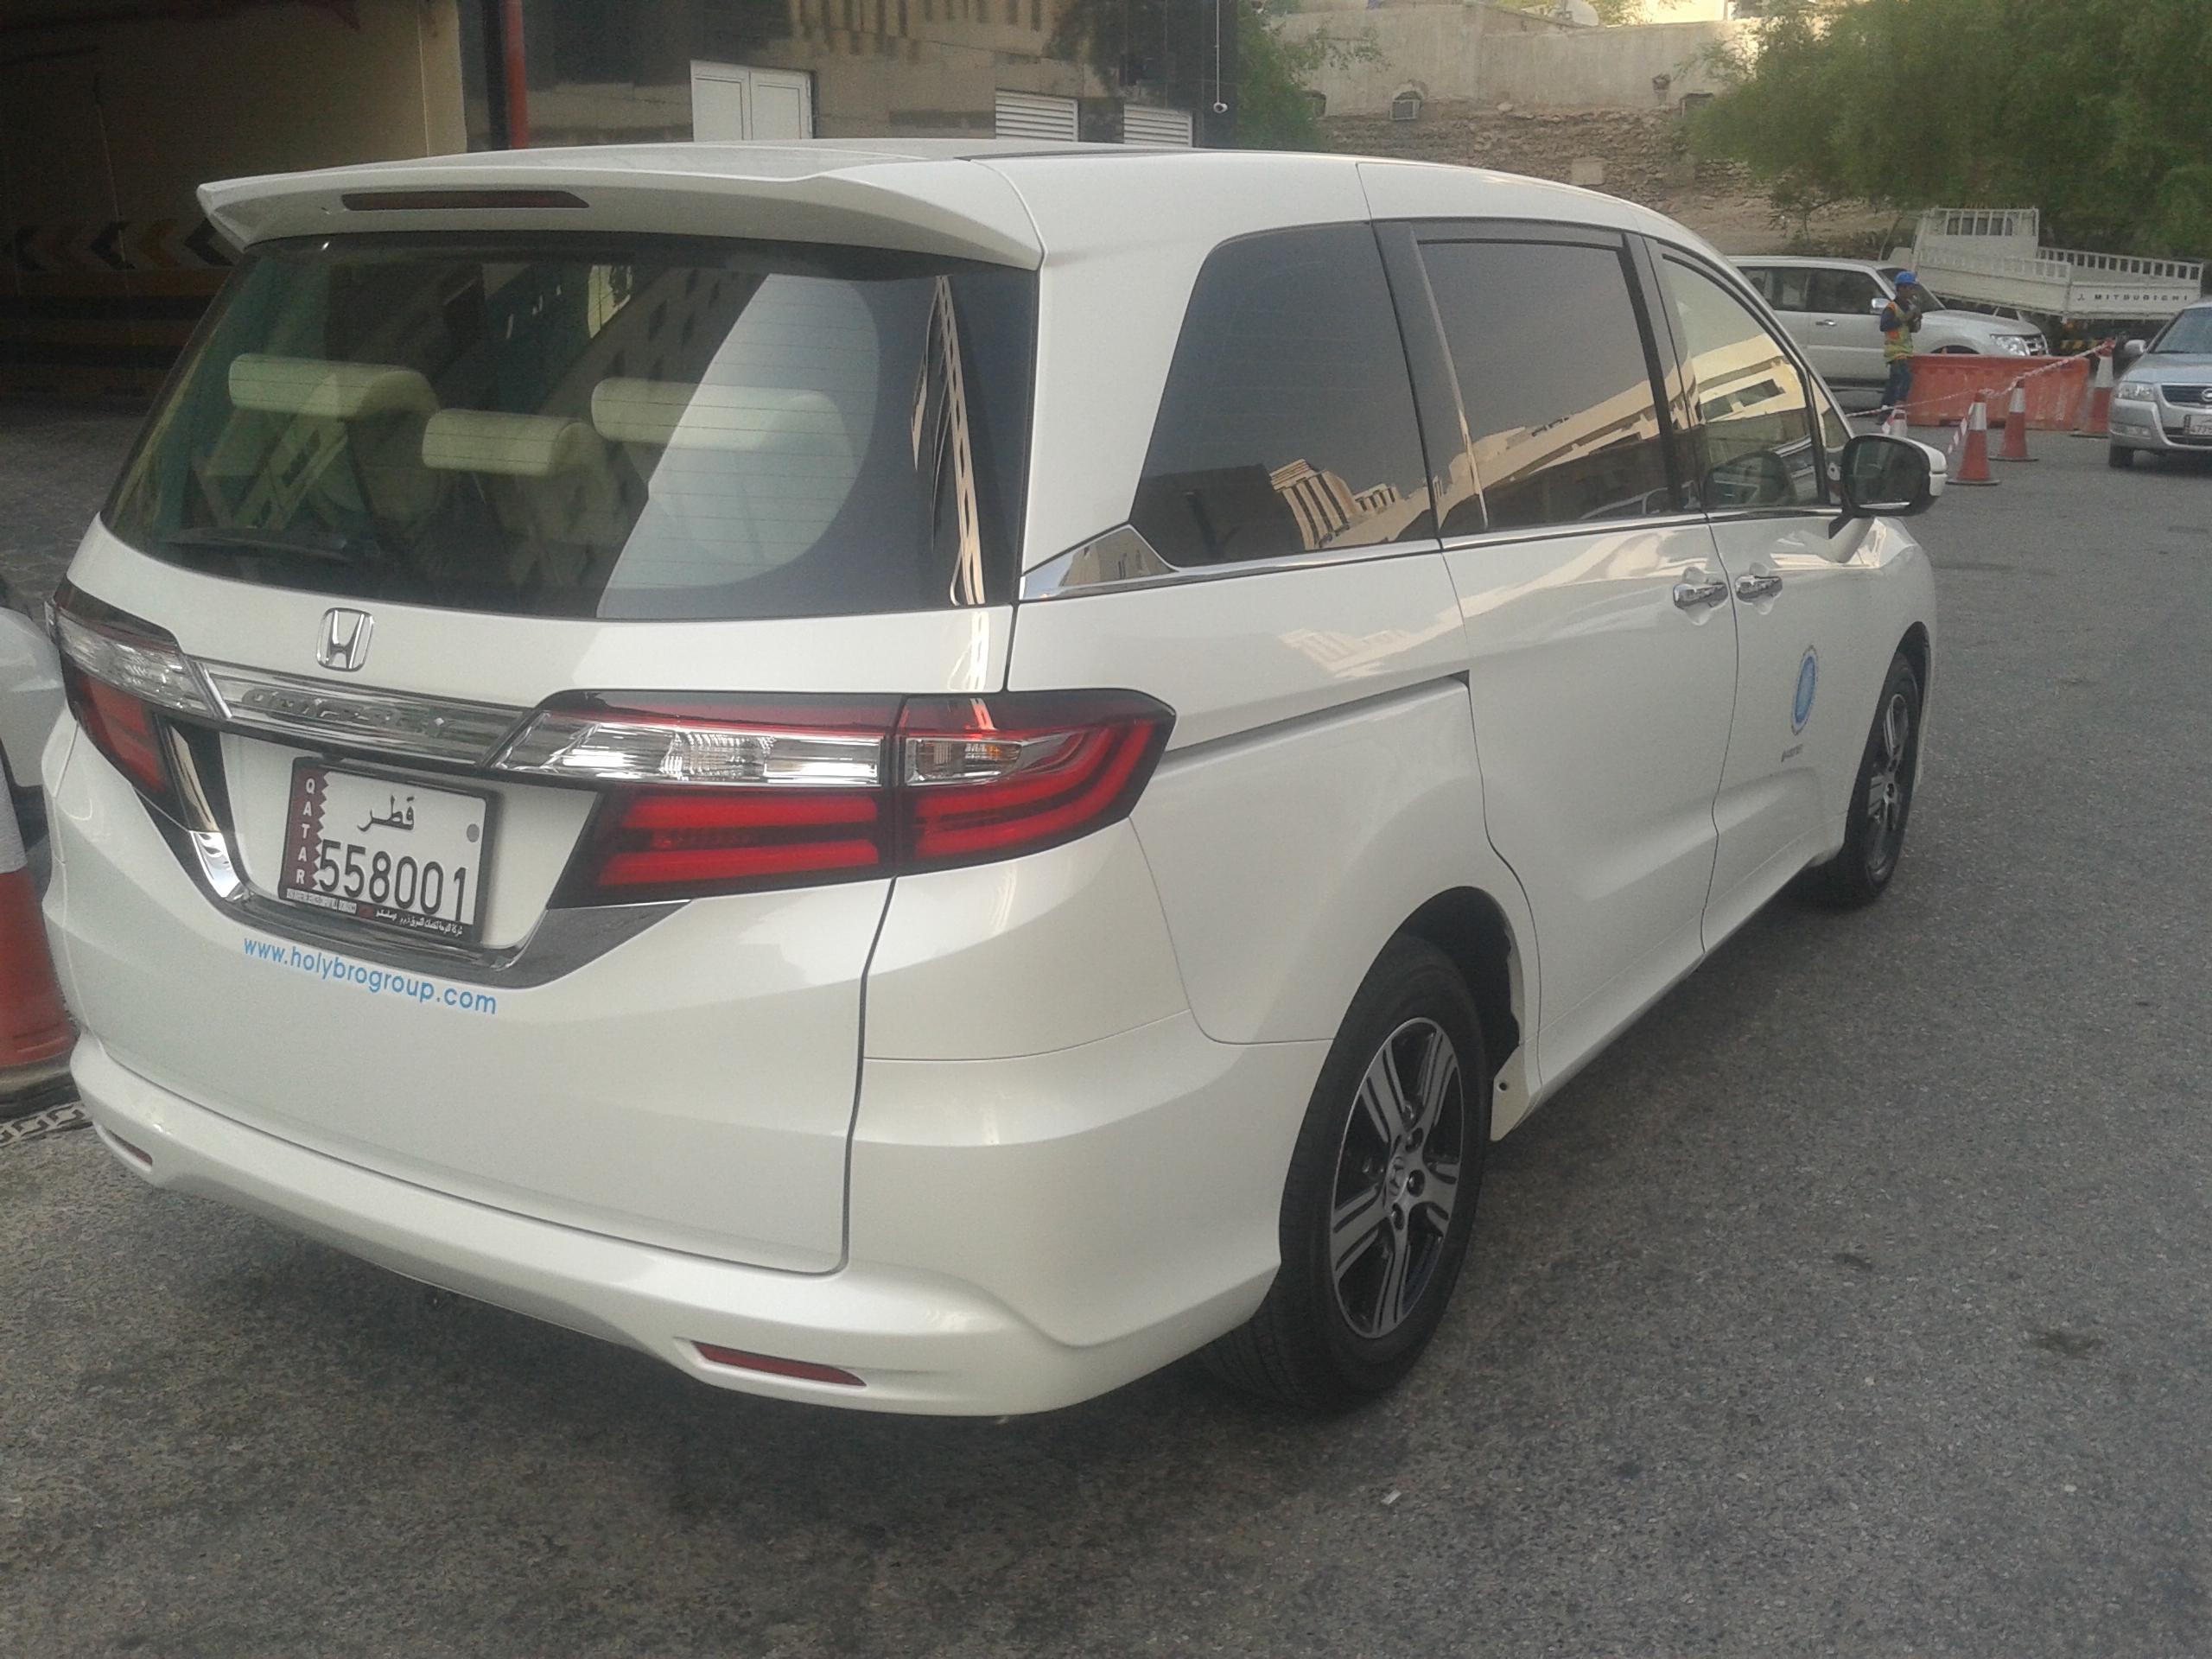 Big Limousine 7 SEATER HONDA Taxi Car Rental ODYSSEY VAN